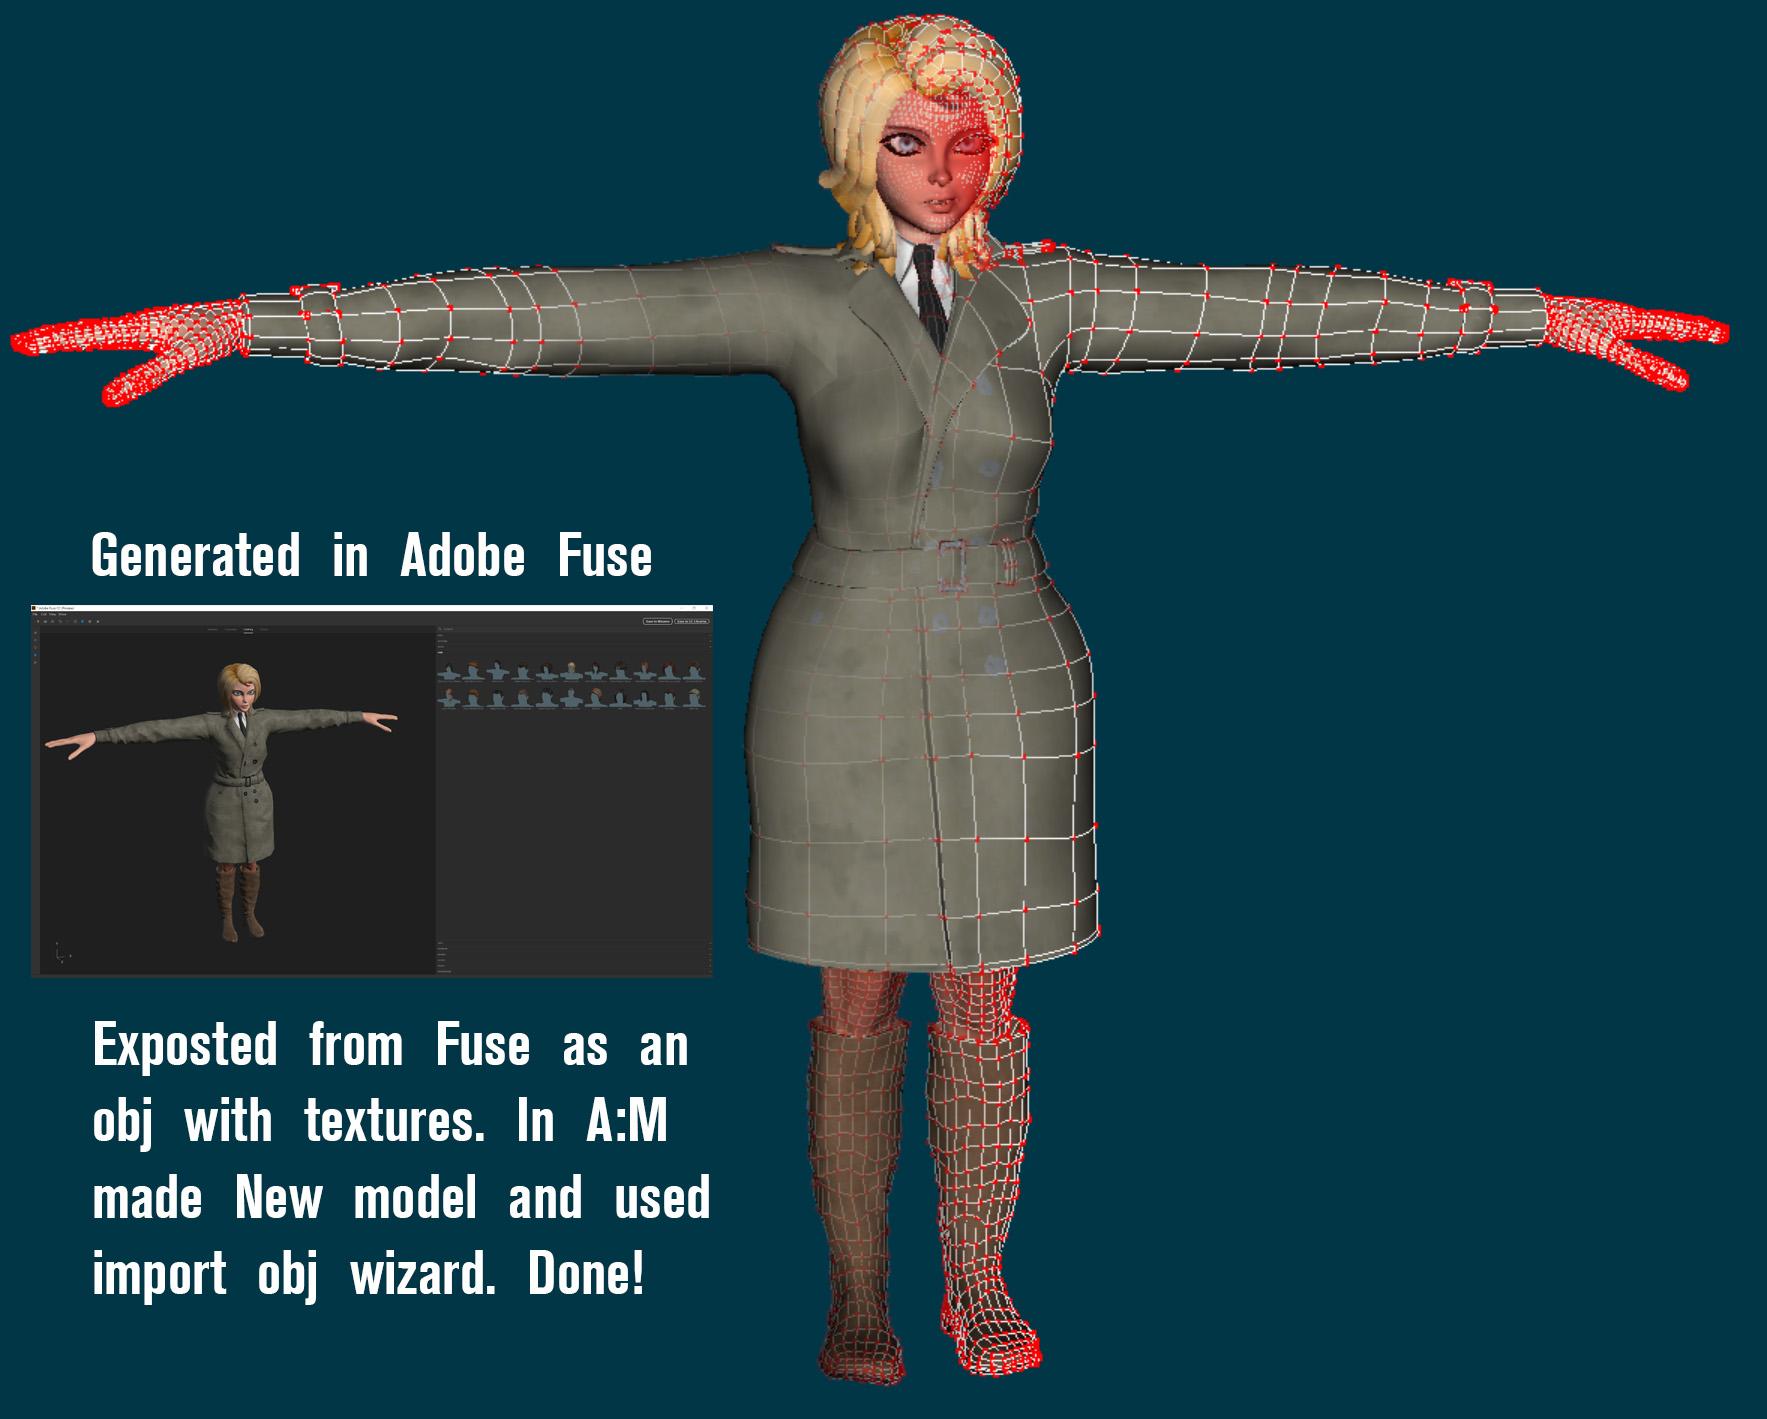 Adobe Fuse Download Size